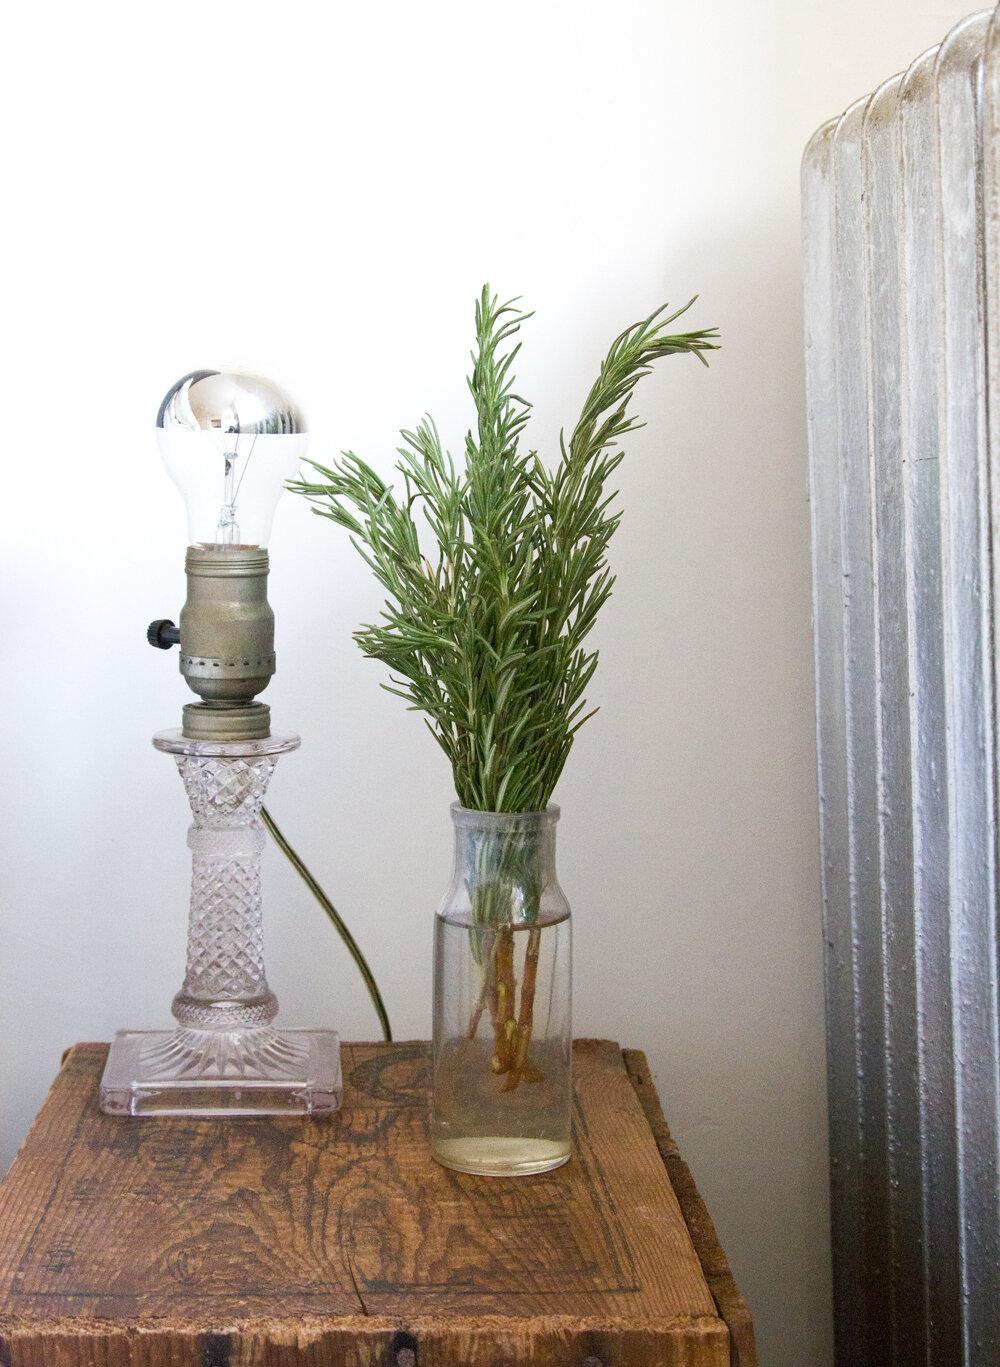 rosemary sprigs on nightstand | reading my tea leaves